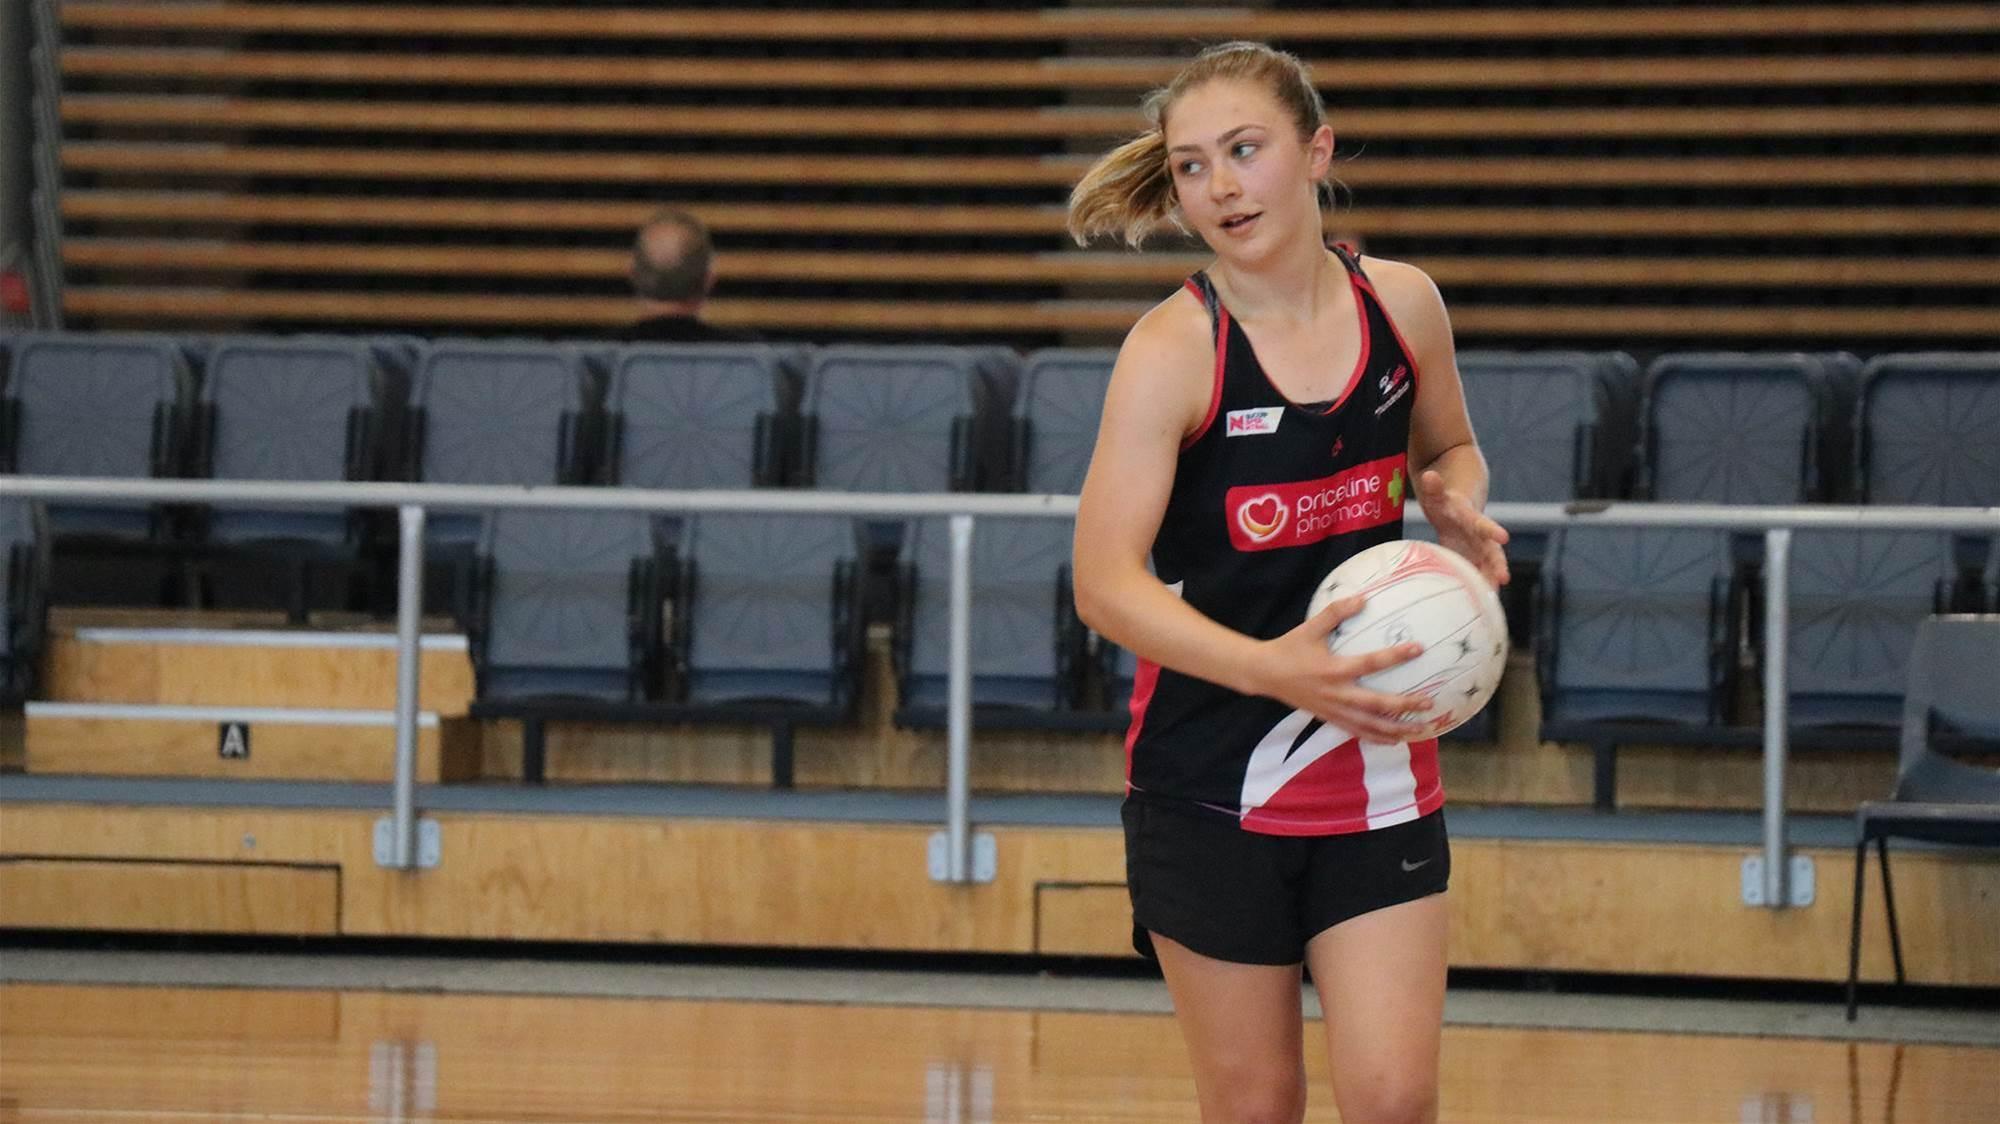 Thunderbirds teenager to make debut